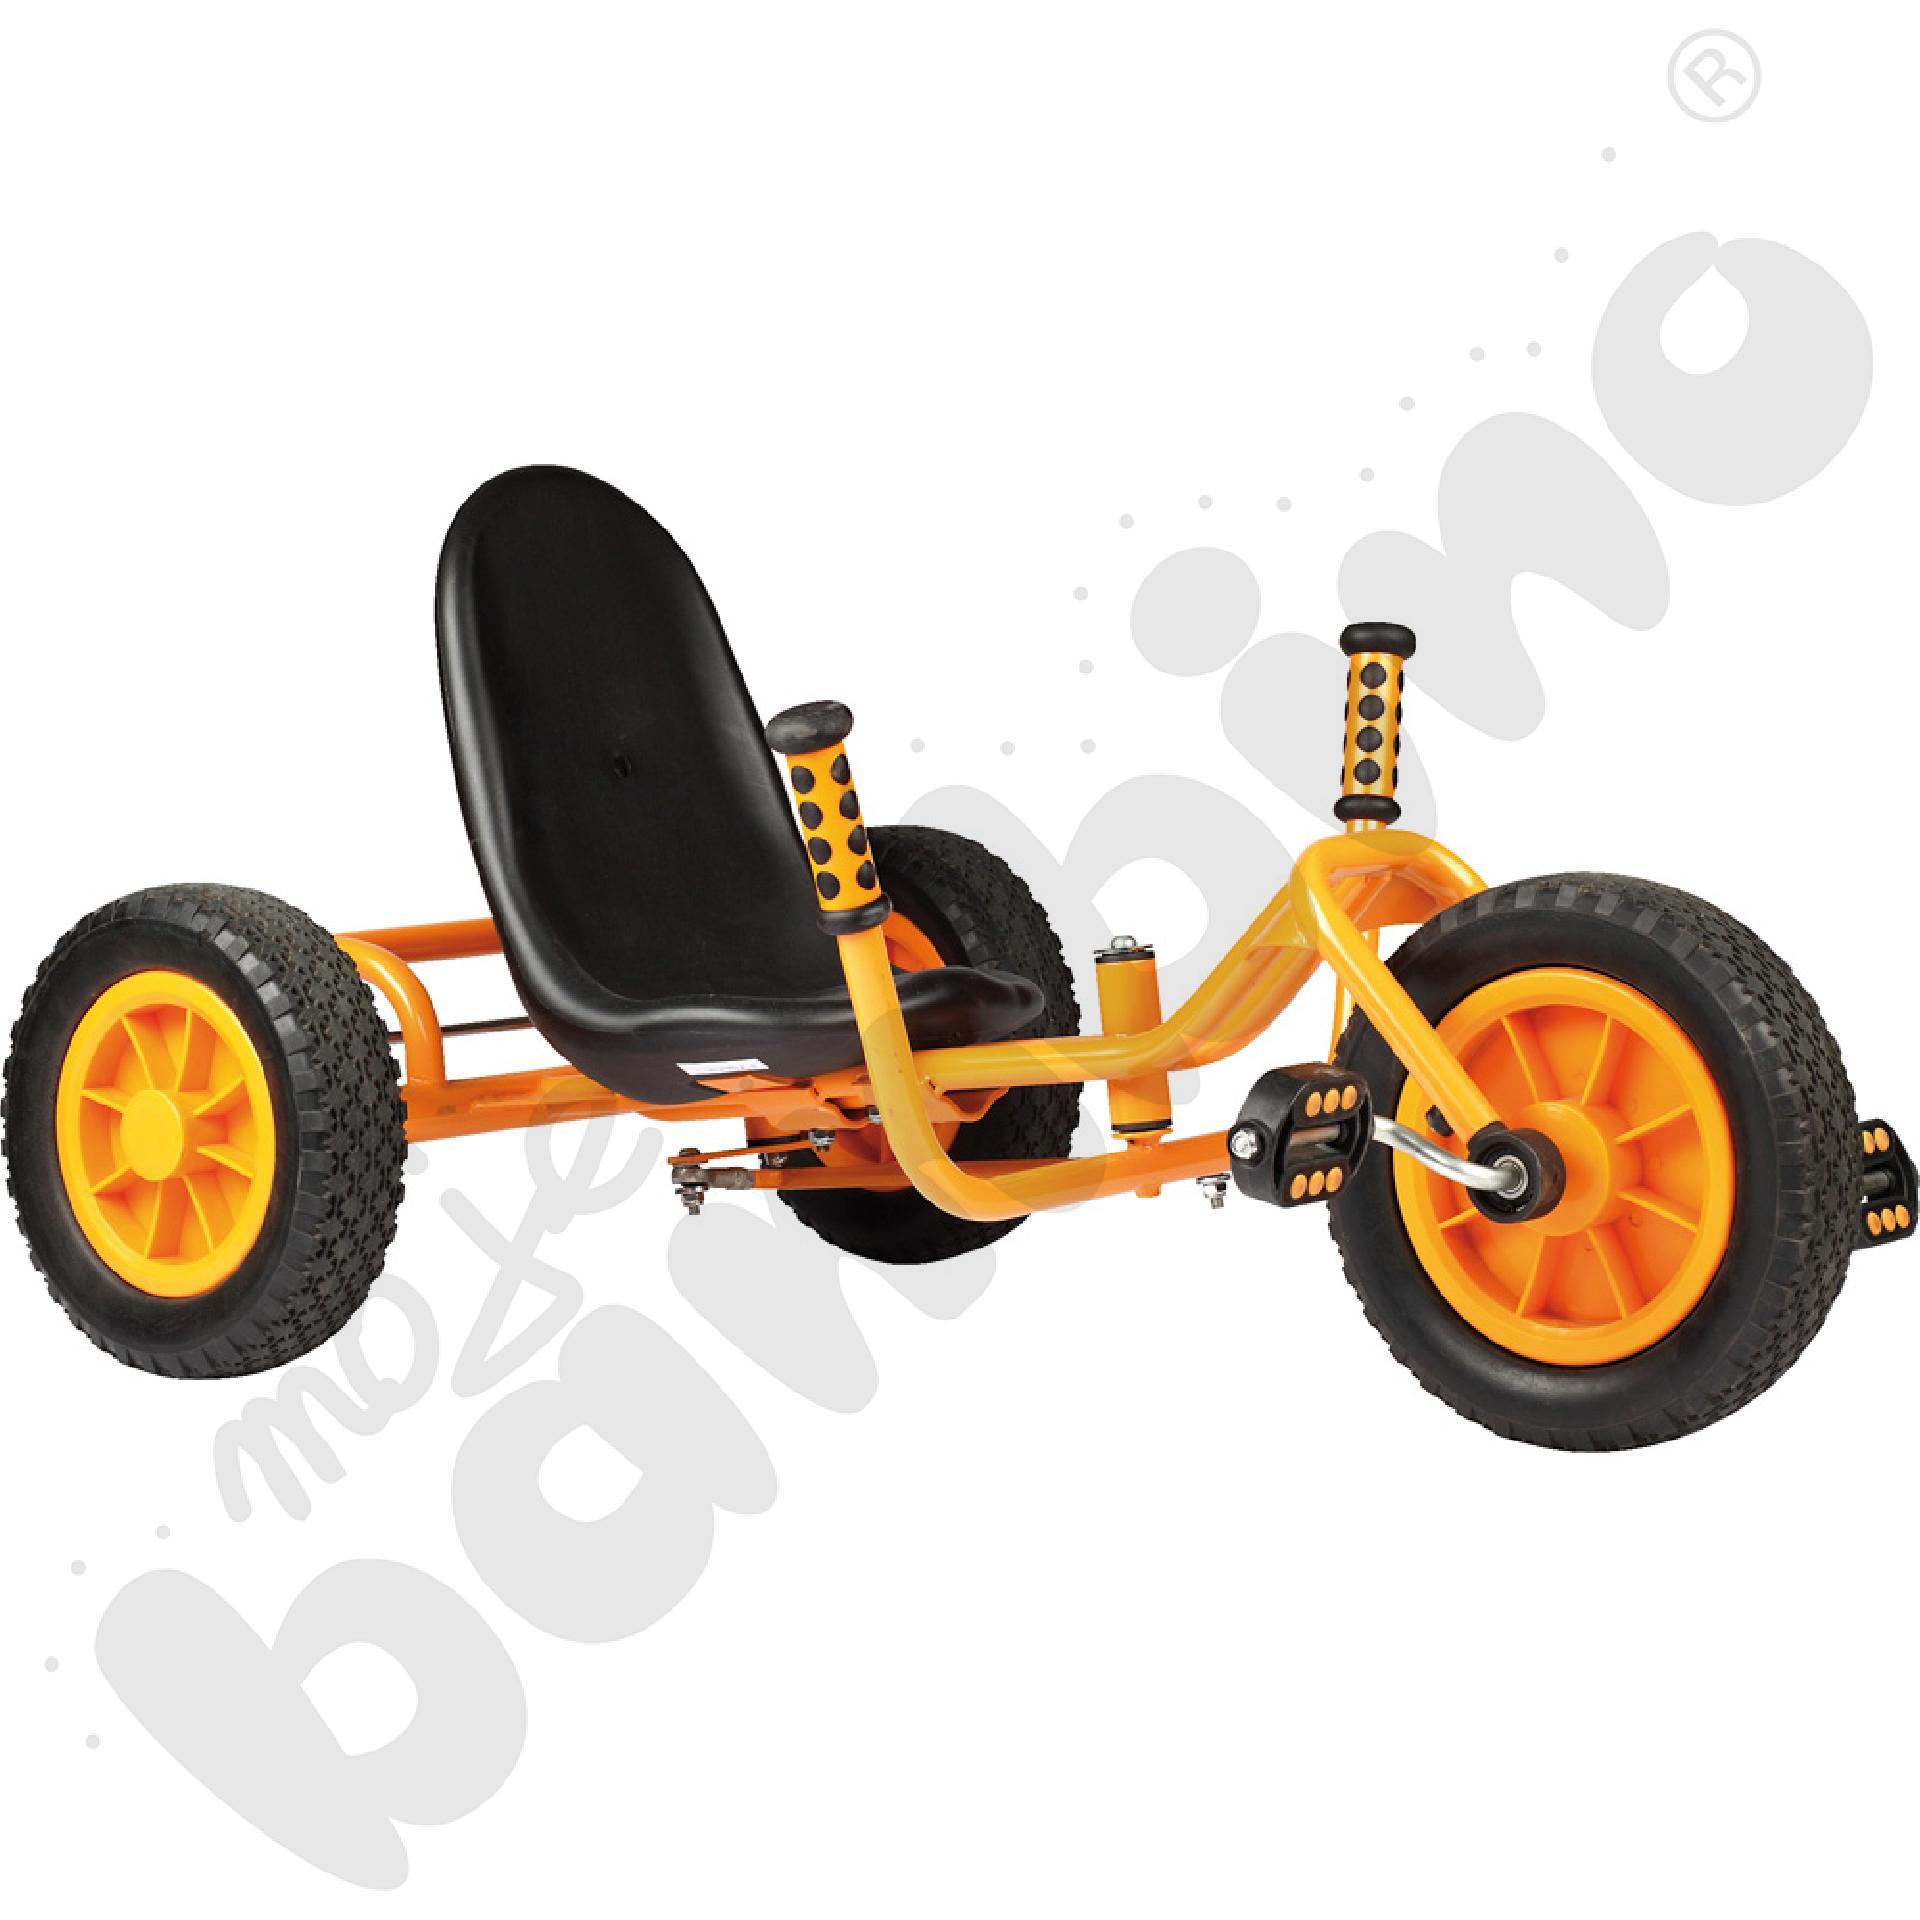 Rider - rowerek poziomyaaa